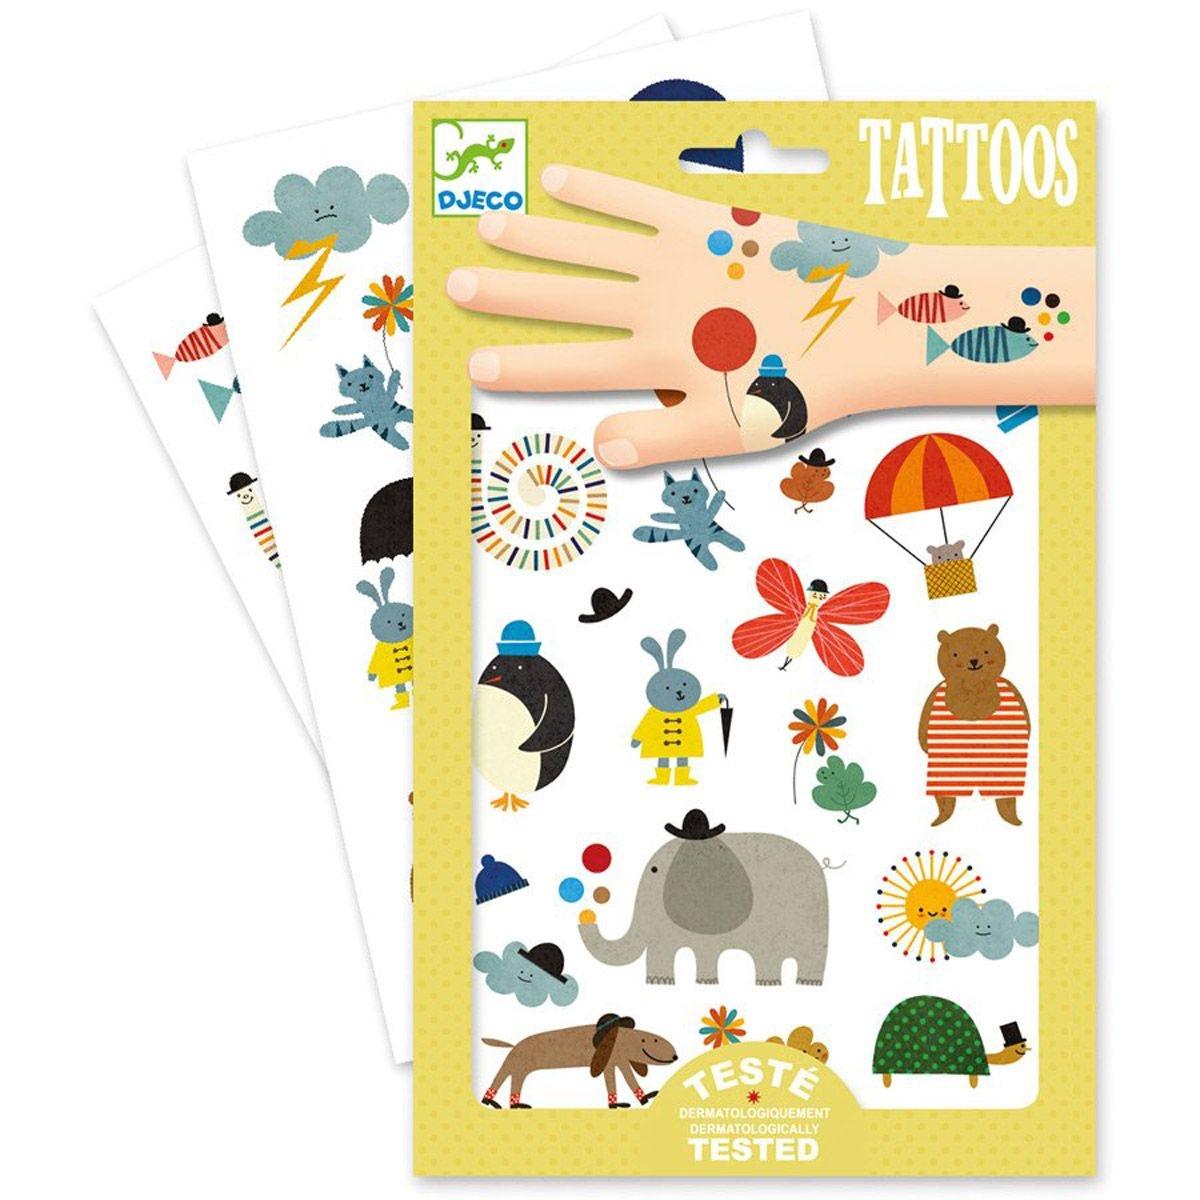 Tatouages : Jolies petites choses